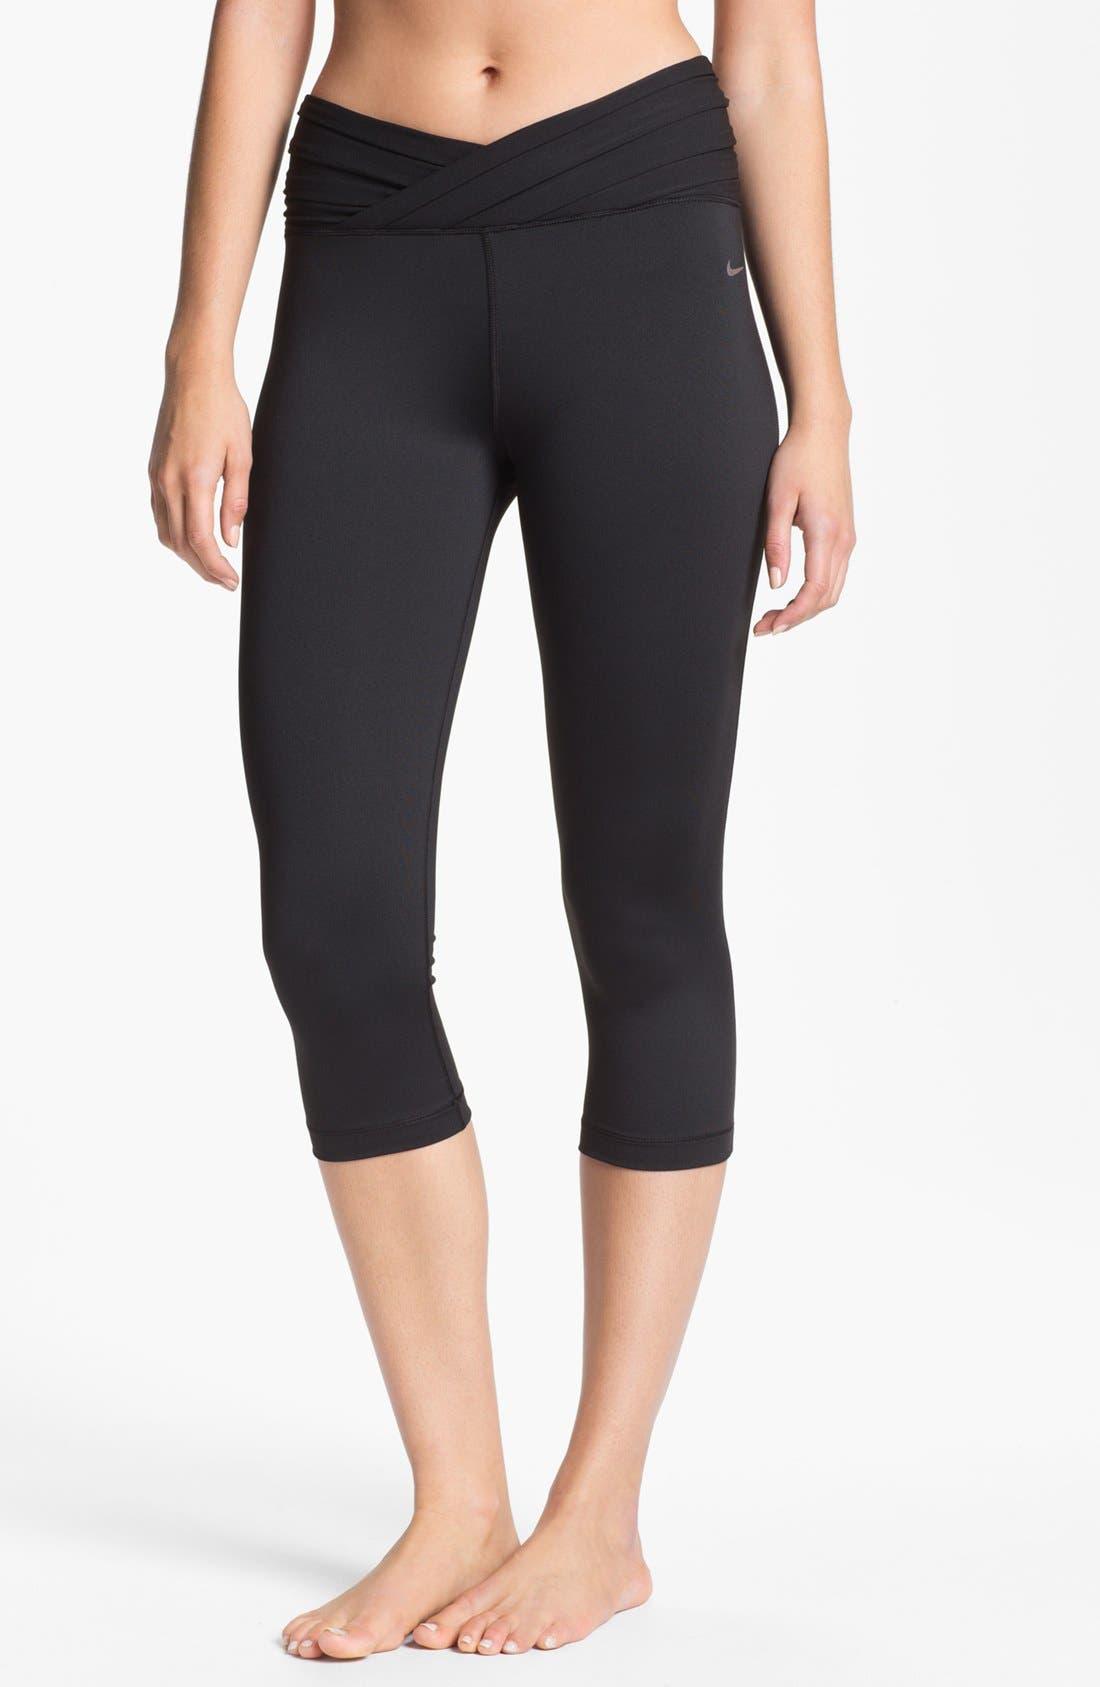 Alternate Image 1 Selected - Nike 'Gym Om' Capri Leggings